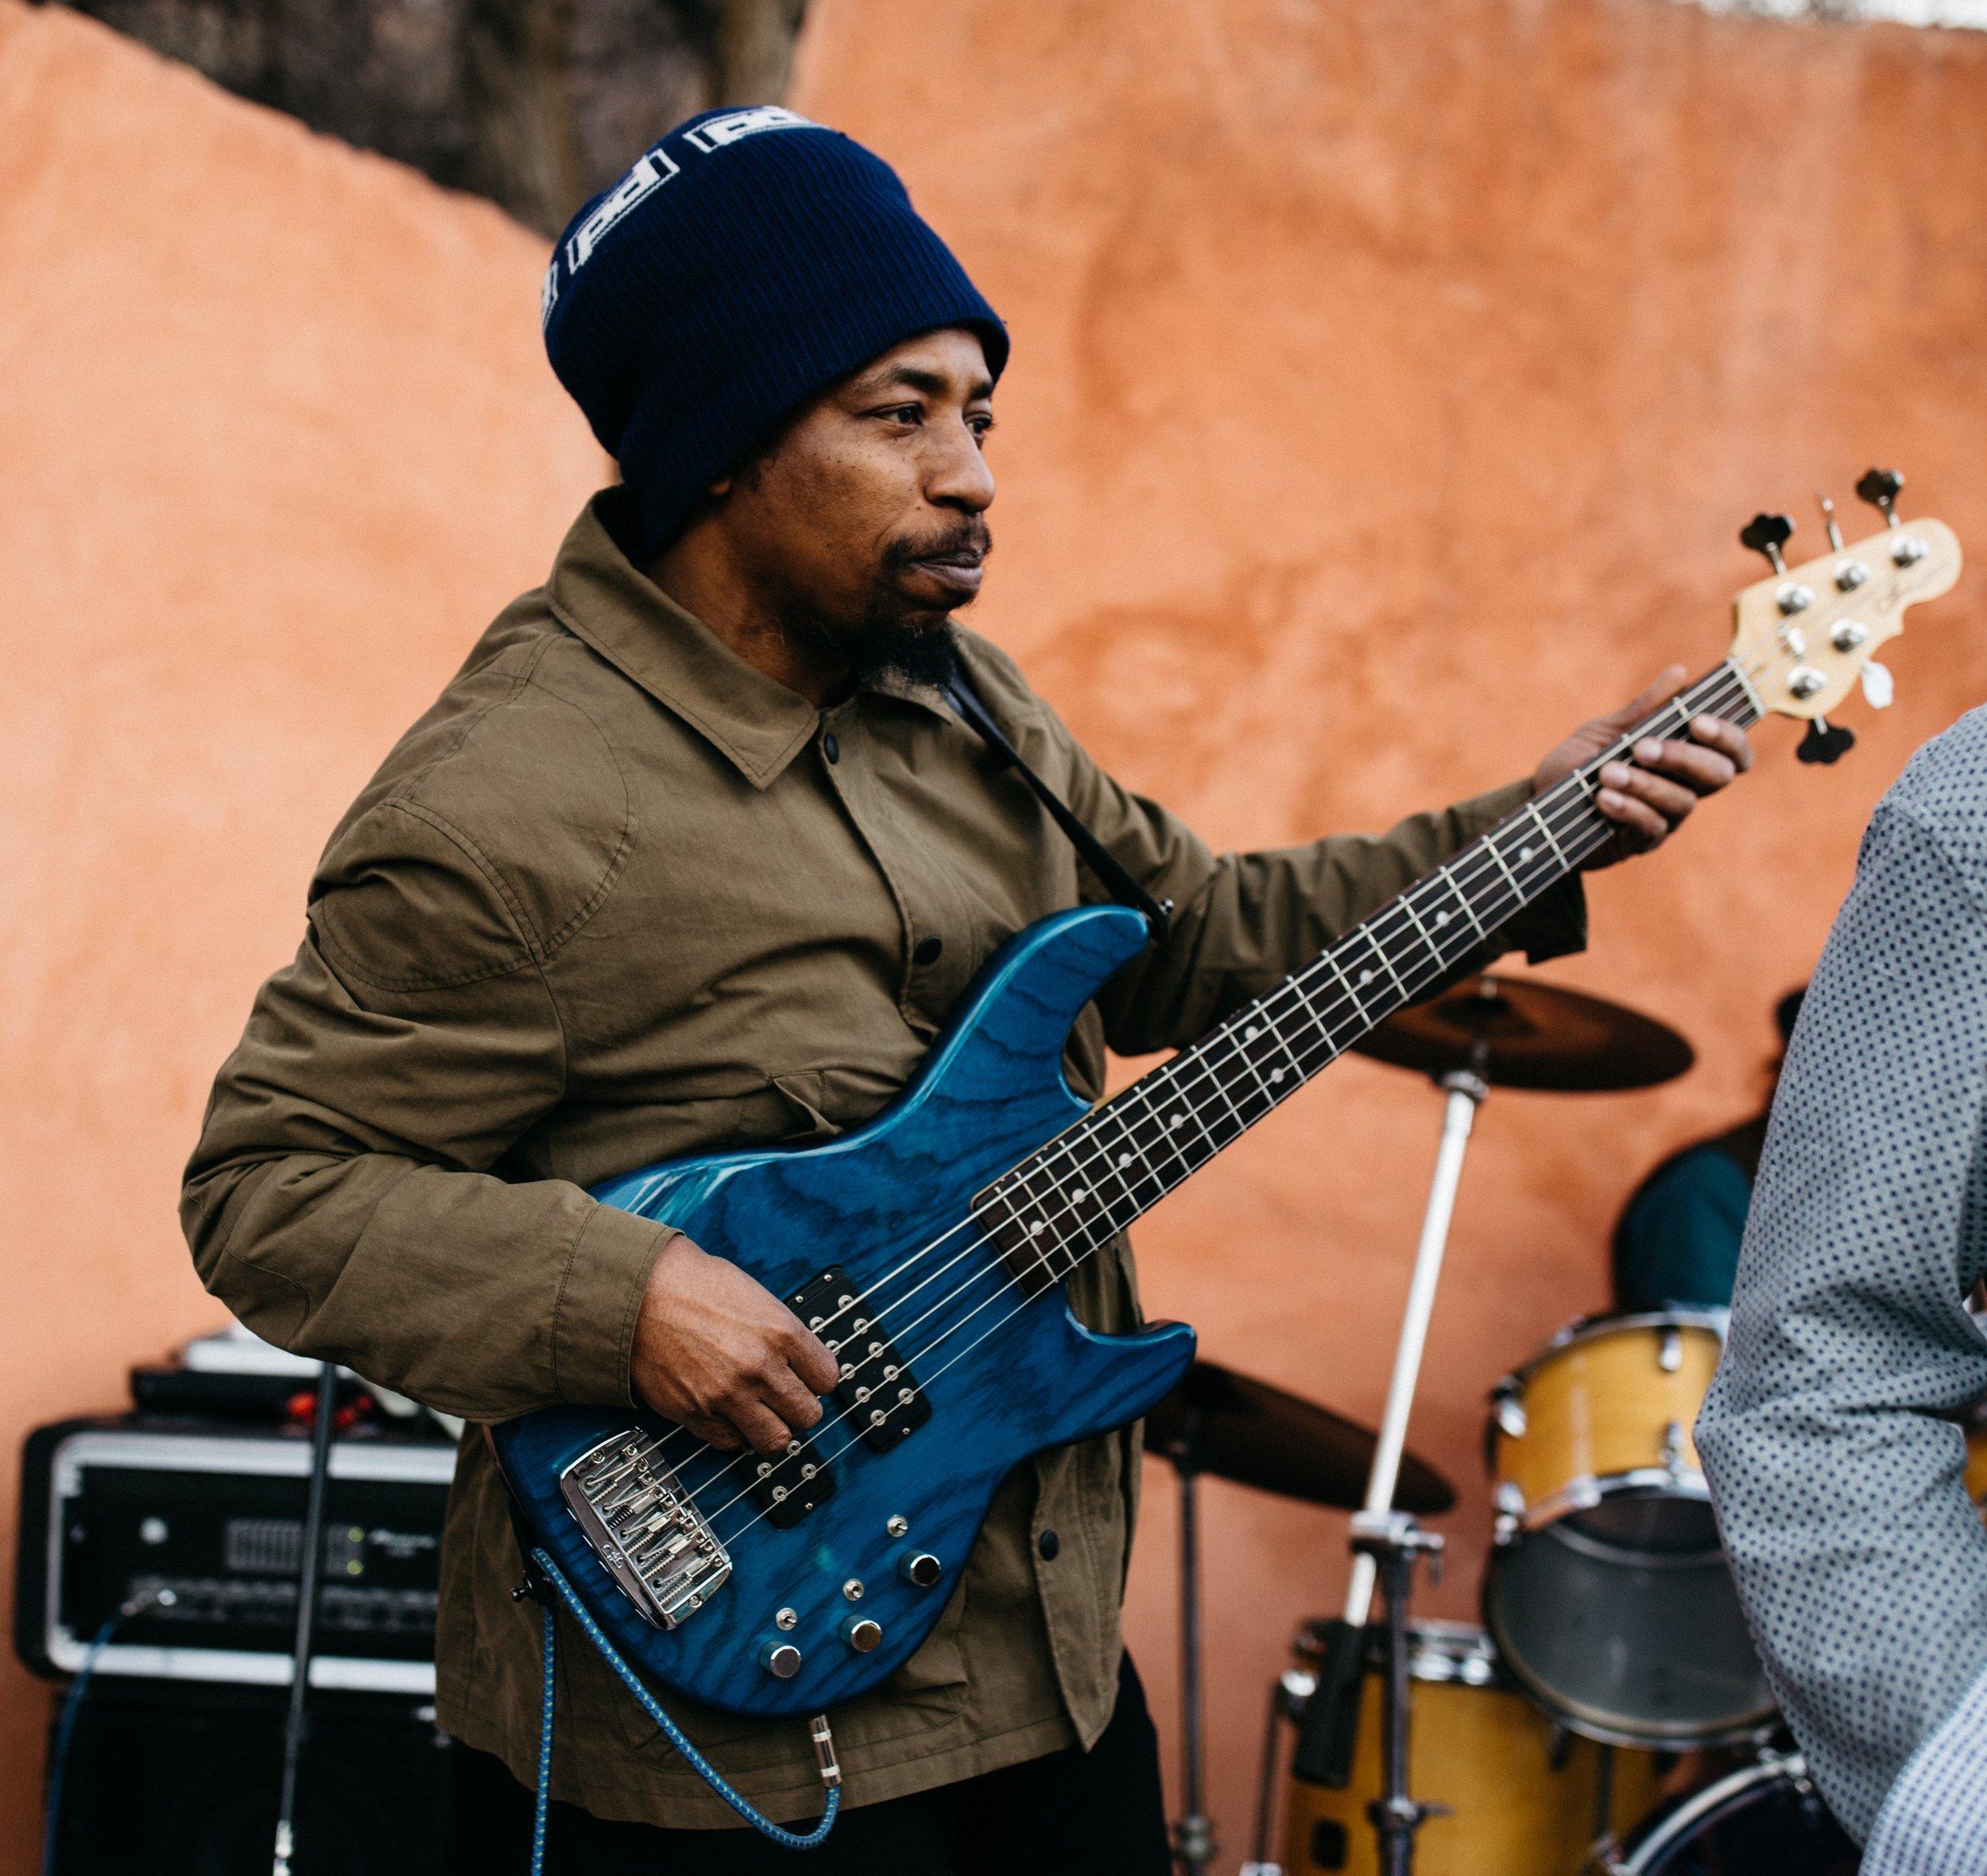 Ian Anderson - Bass / VocalsPhoto by Sharee Davenport